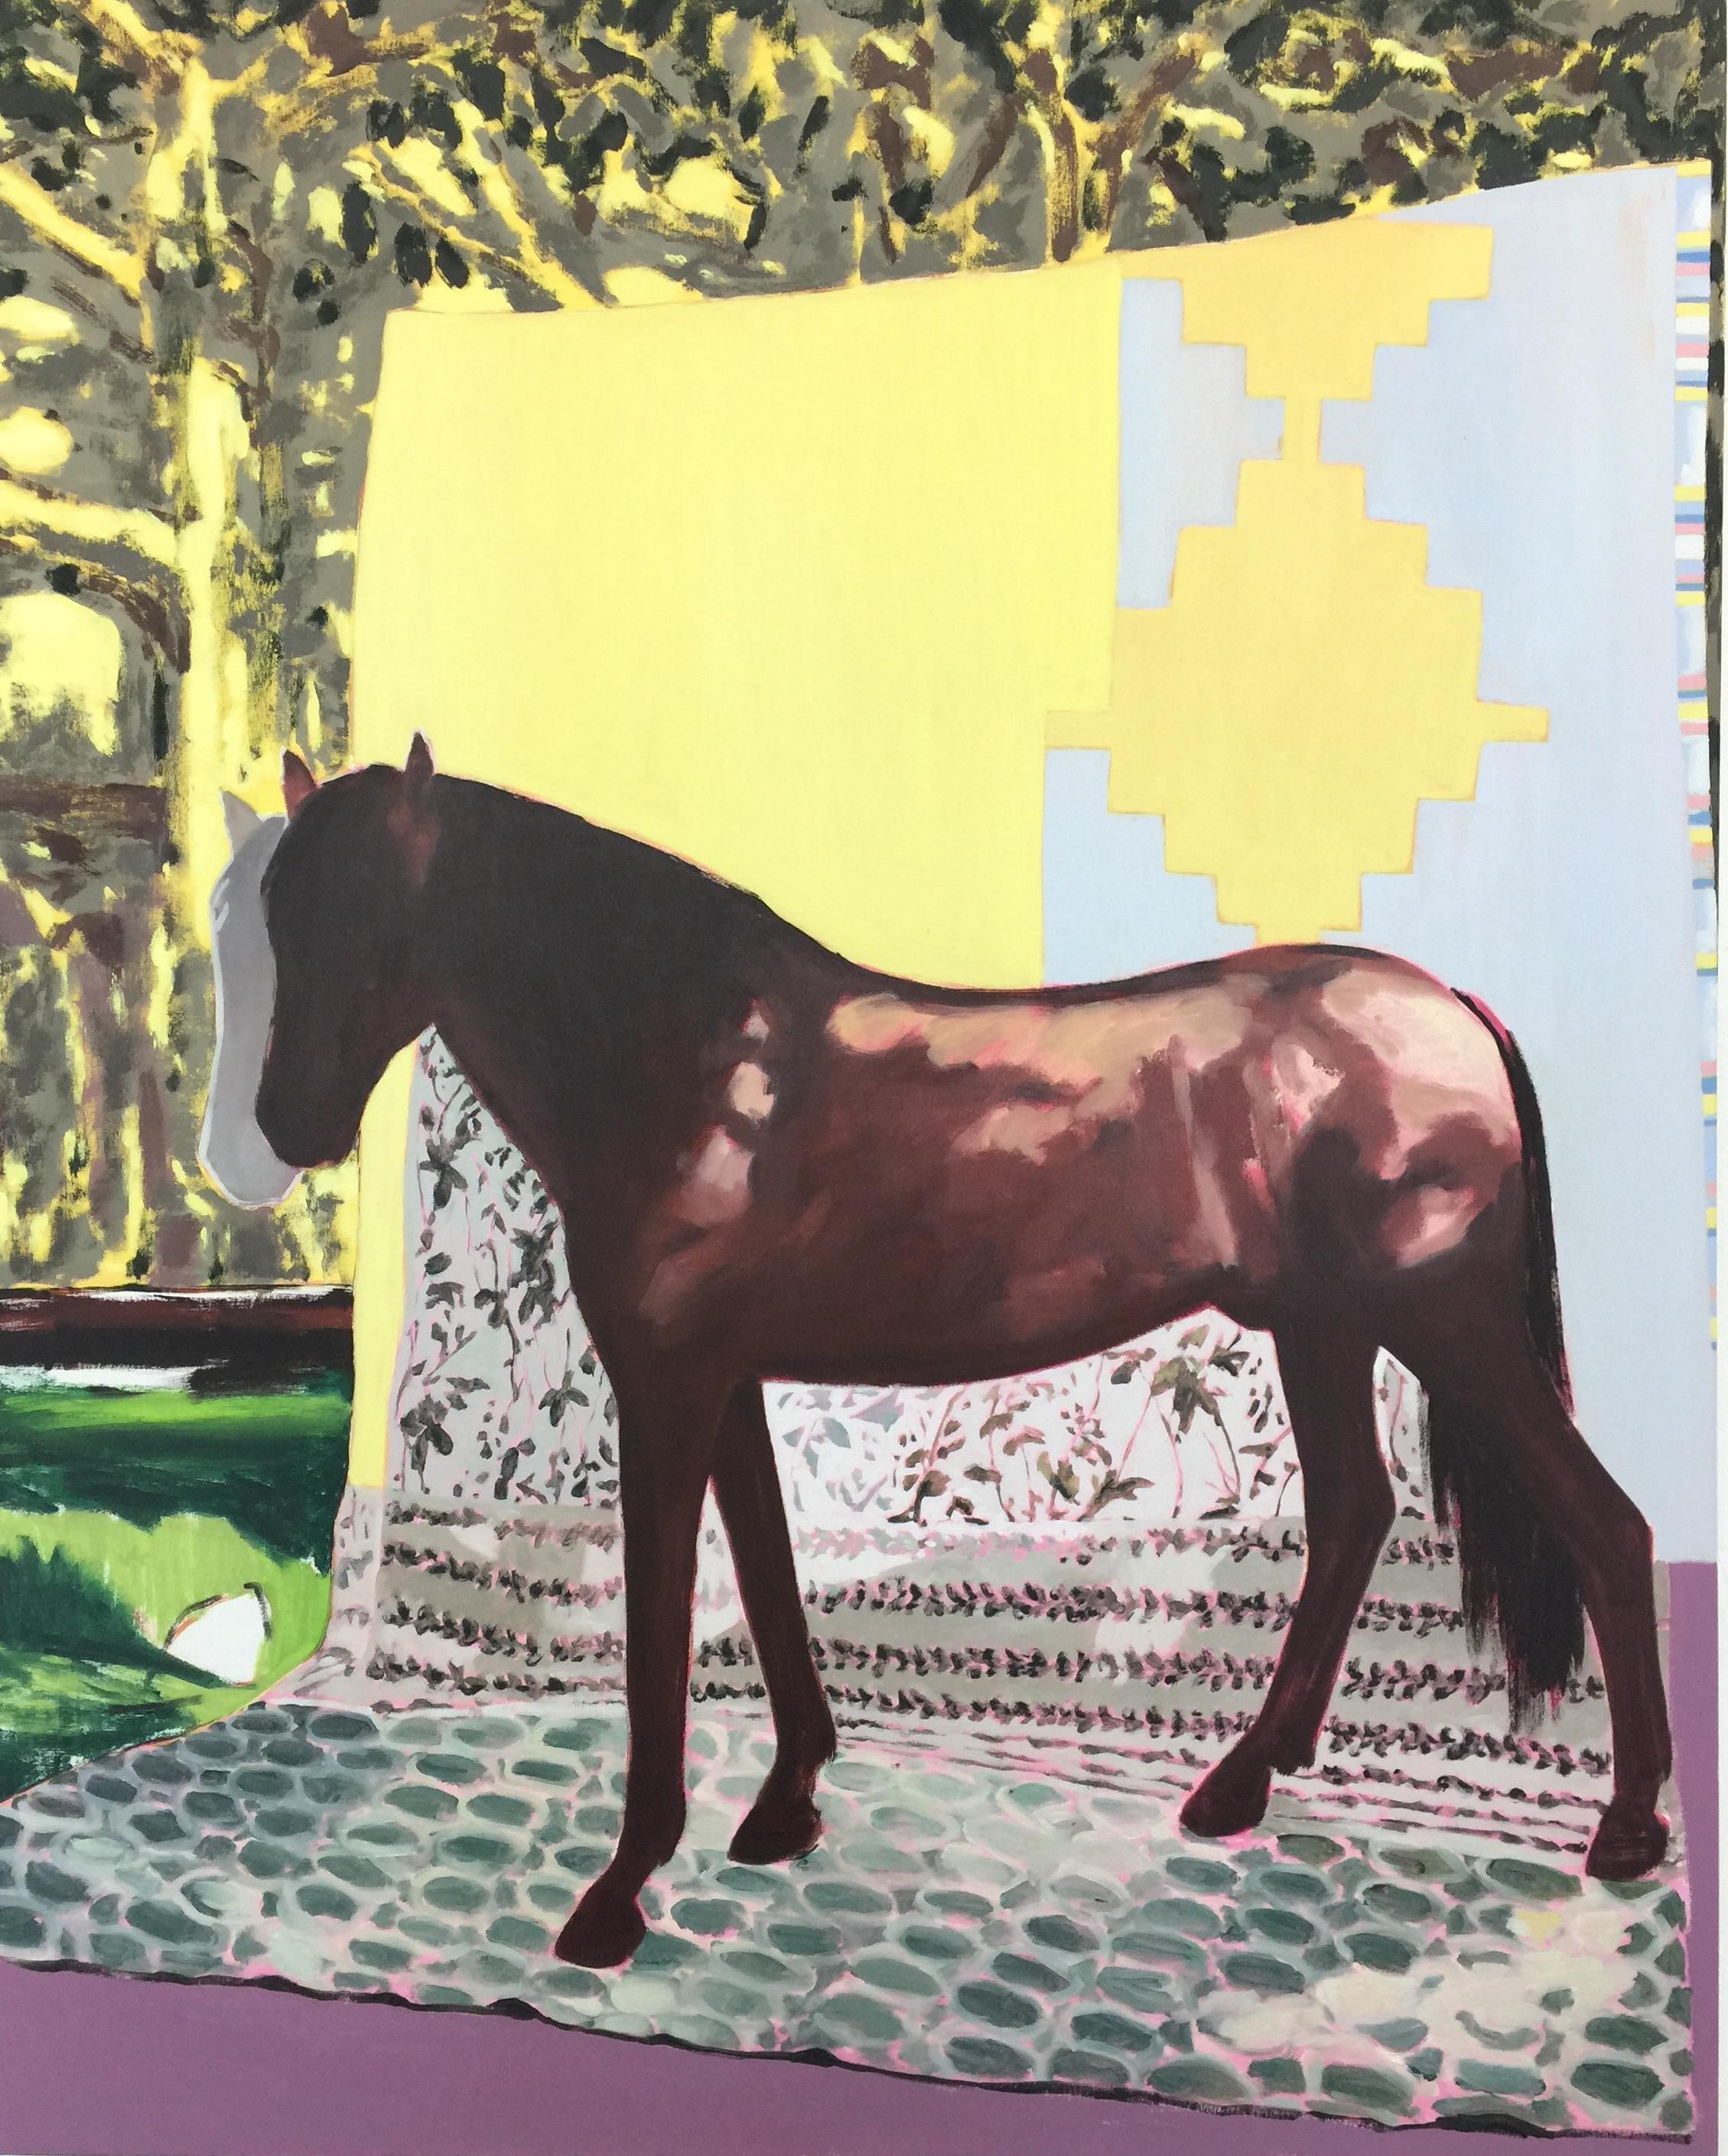 Riderless , 2019 Acrylic and oil on canvas 152 x 122 cm